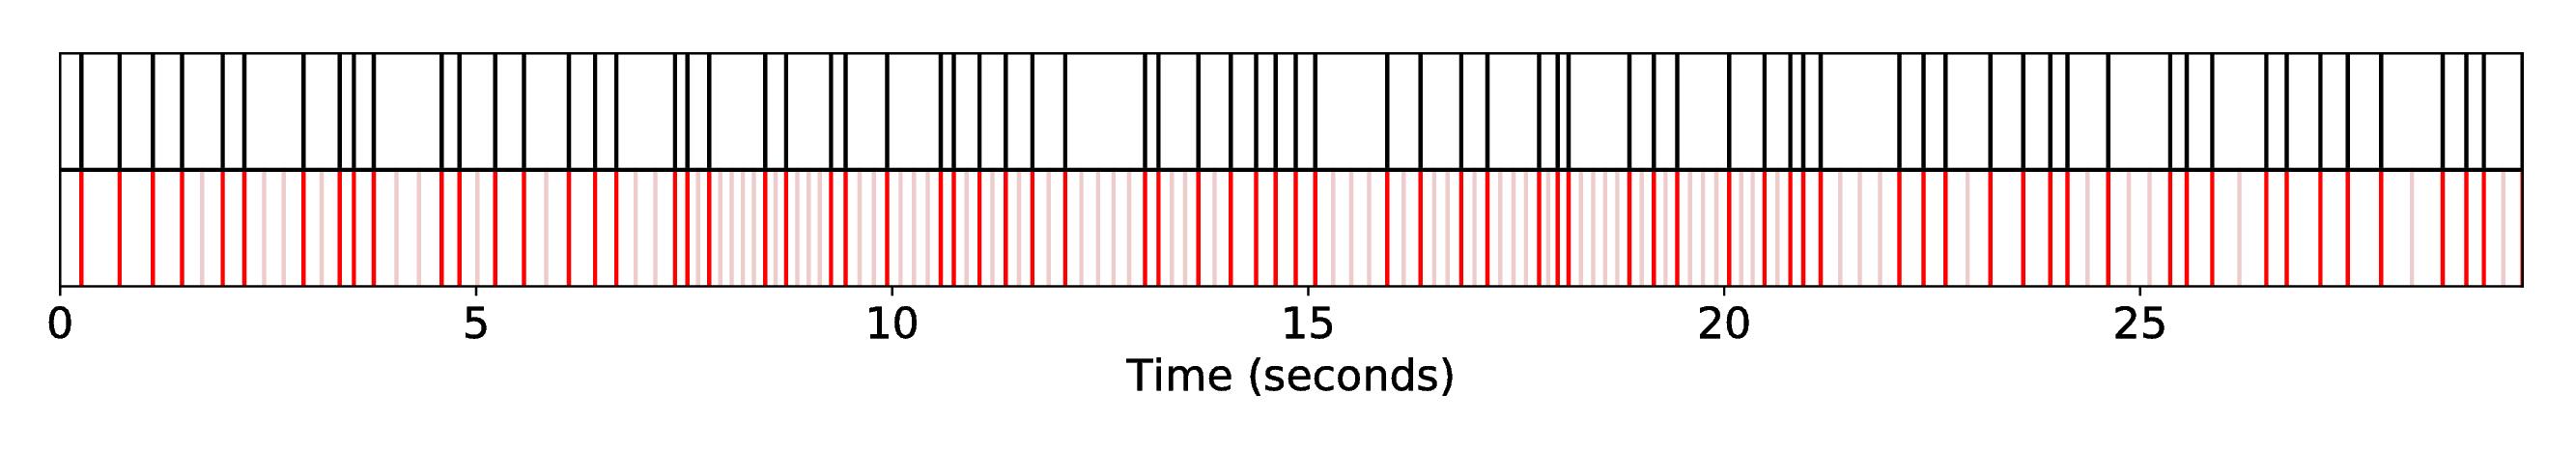 DP1_INT1_R-Syn-Ra__S-Bach__SequenceAlignment